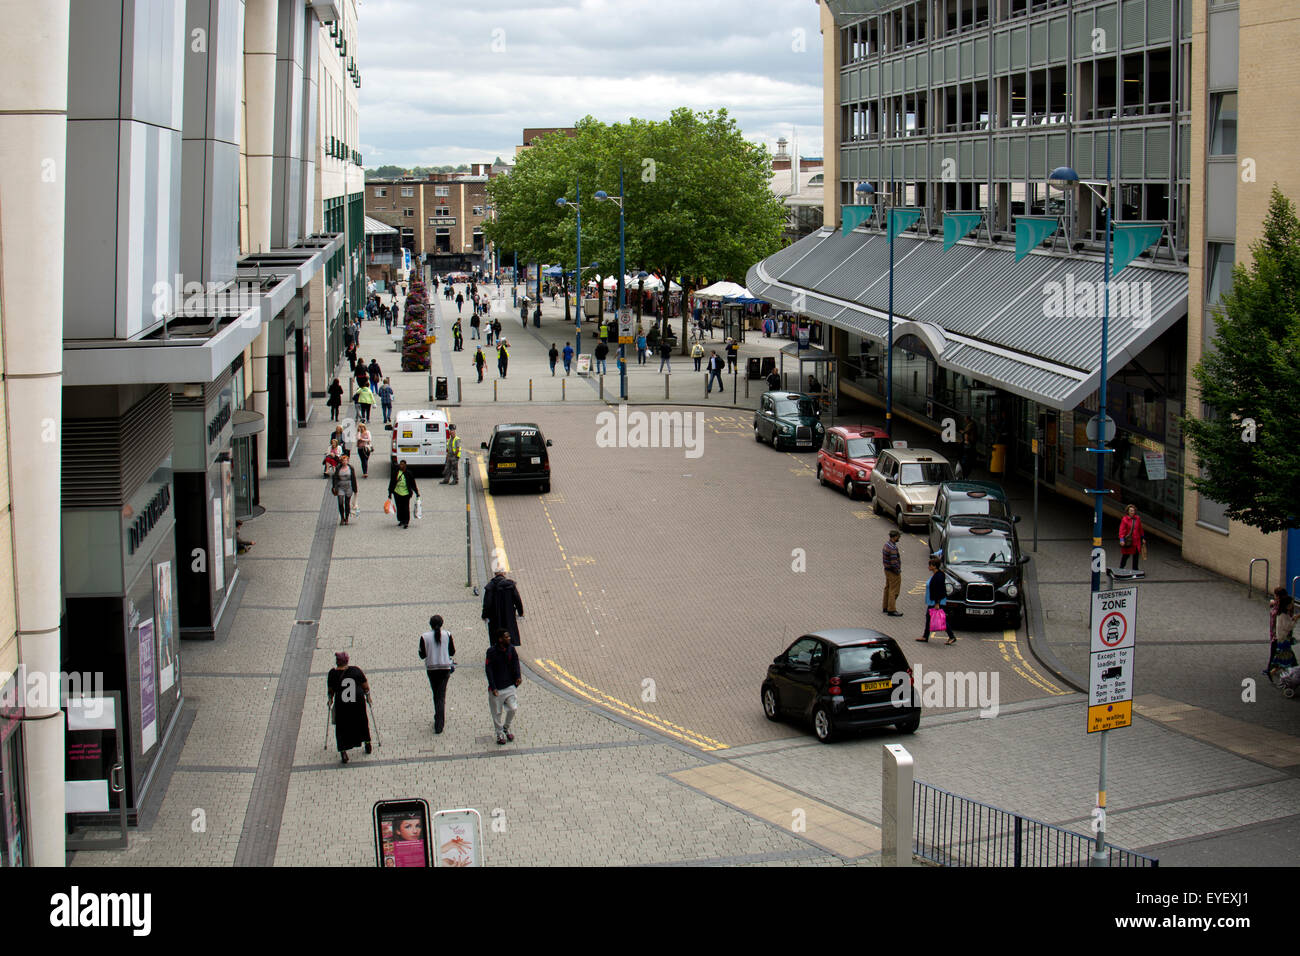 Edgbaston Street, Birmingham city centre, UK - Stock Image